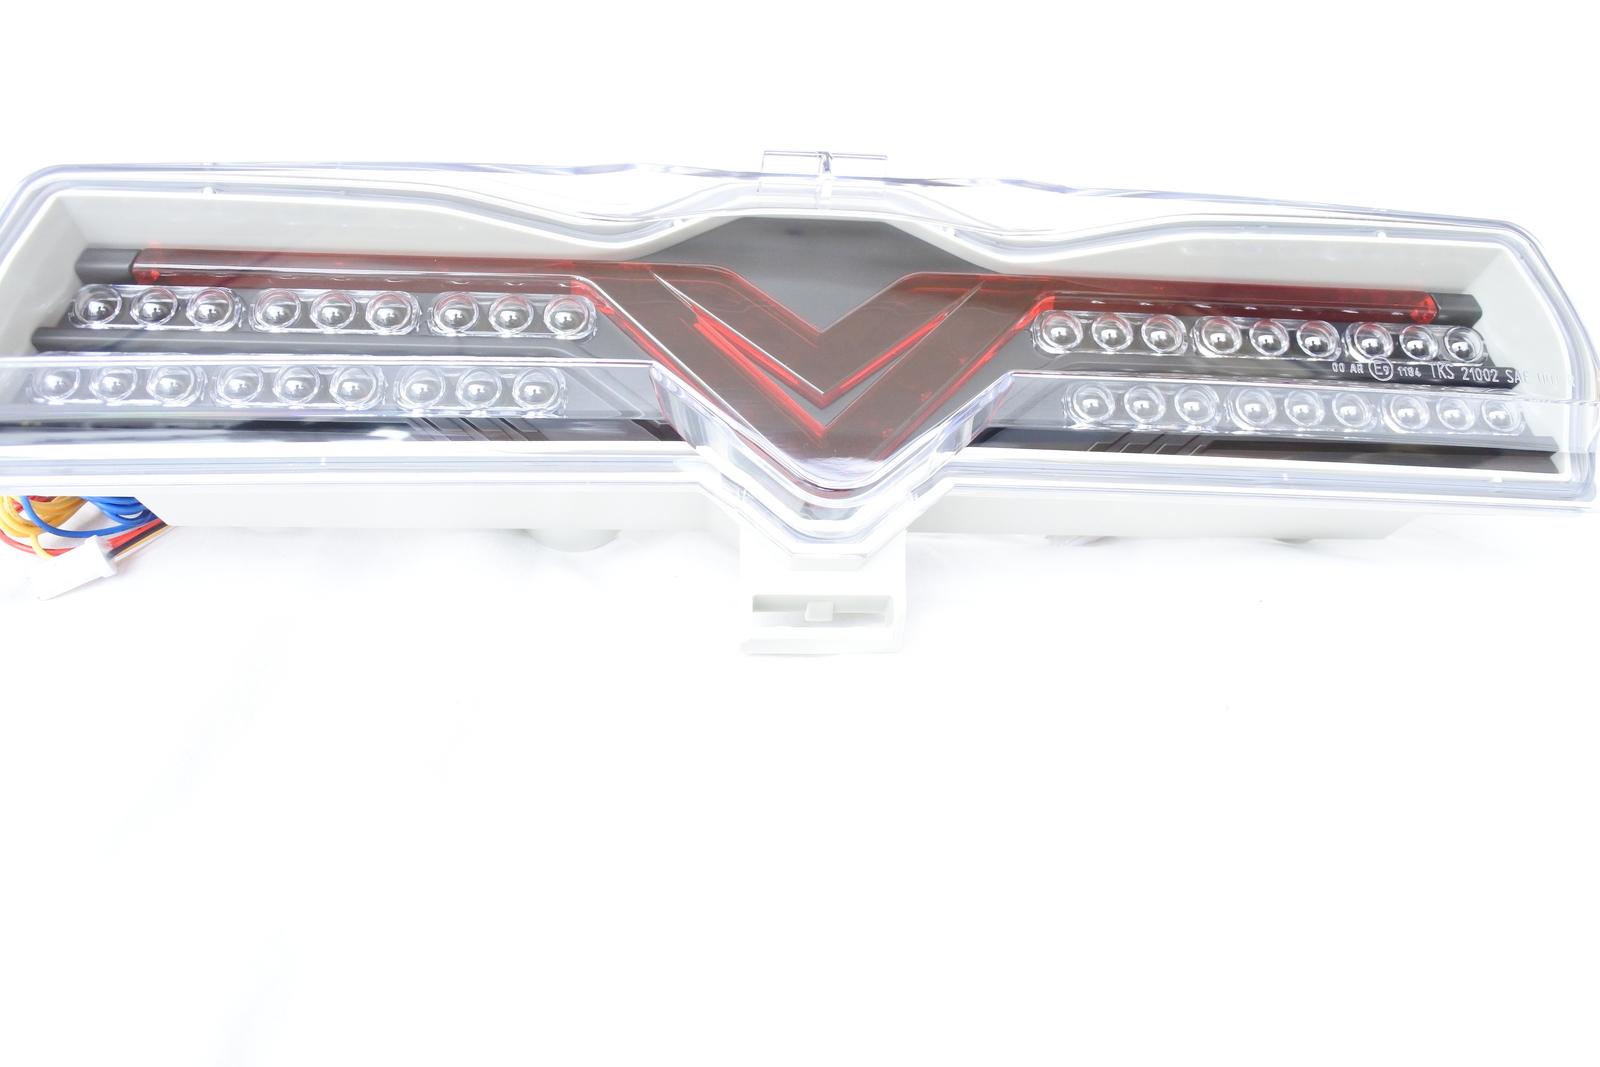 TOYOTA 86(ZN6) & SUBARU BRZ(ZC6)  バックフォグ&バックランプ フルLED    ブラック/レッドメーカー名 SoulMates商品番号 GTA-011